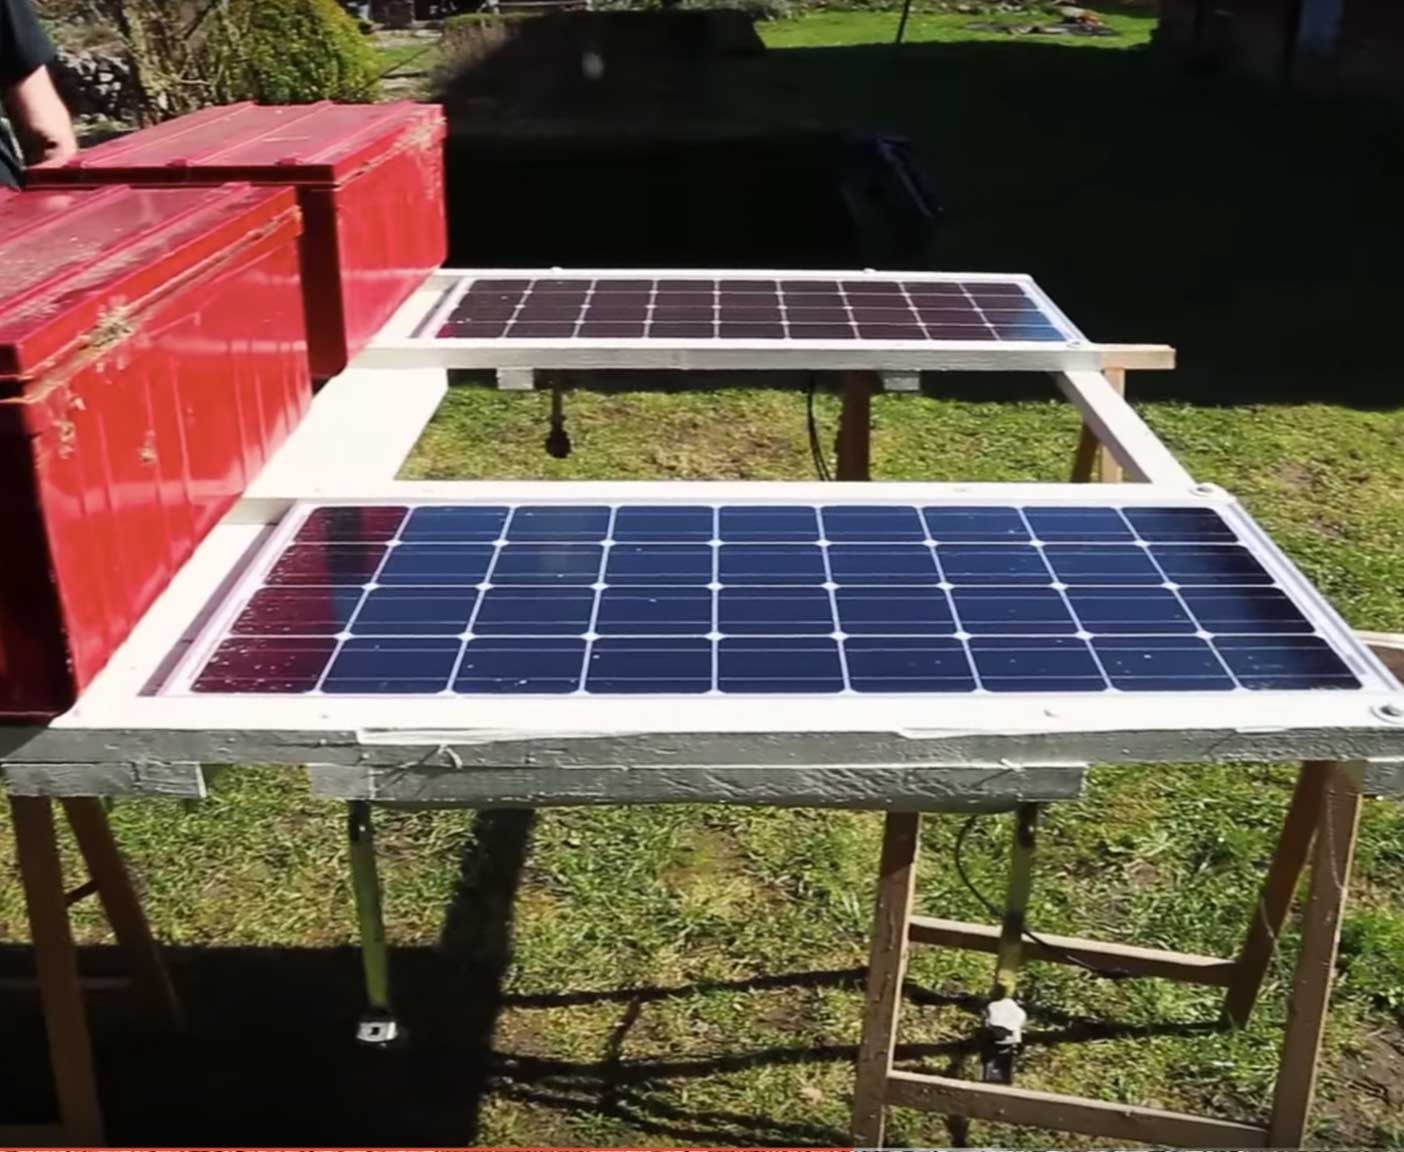 fantastisch solarstrom schaltplan fotos elektrische schaltplan ideen. Black Bedroom Furniture Sets. Home Design Ideas